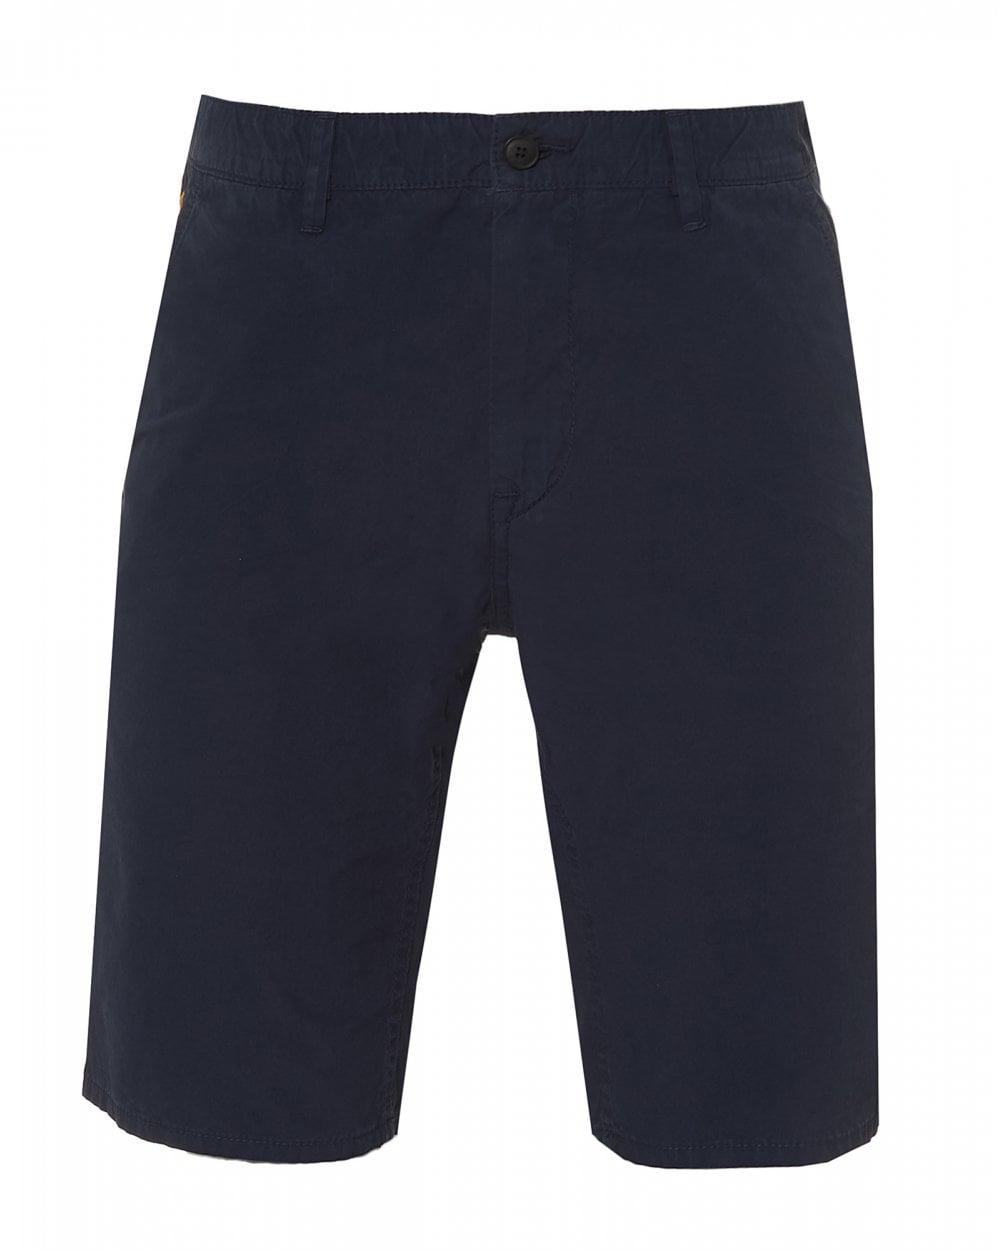 c59ec6af BOSS Casual Mens Schino-Slim-Shorts D Cotton Navy Blue Shorts